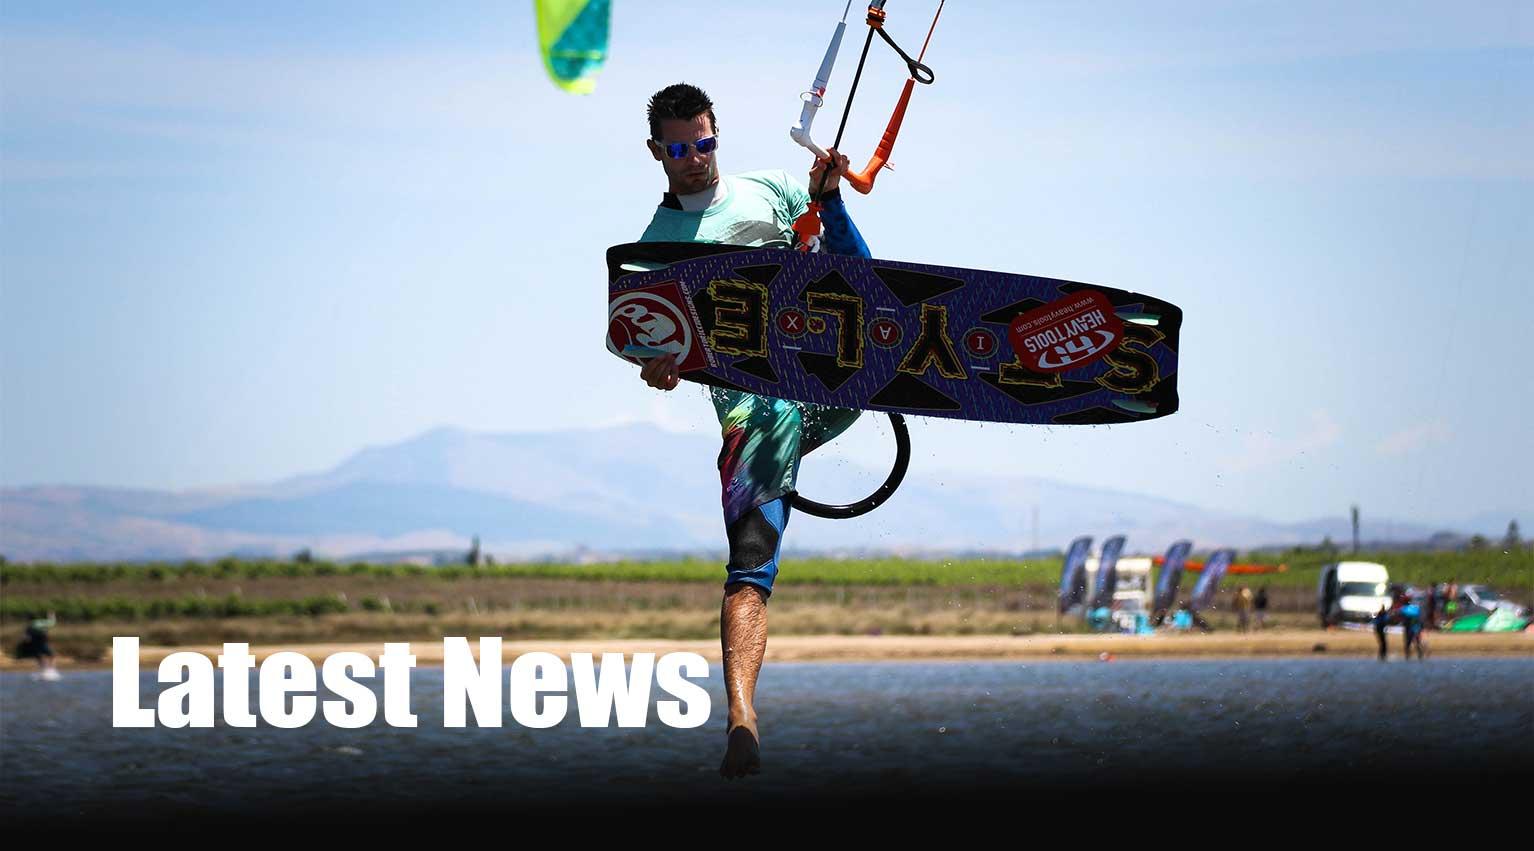 kitesurf news